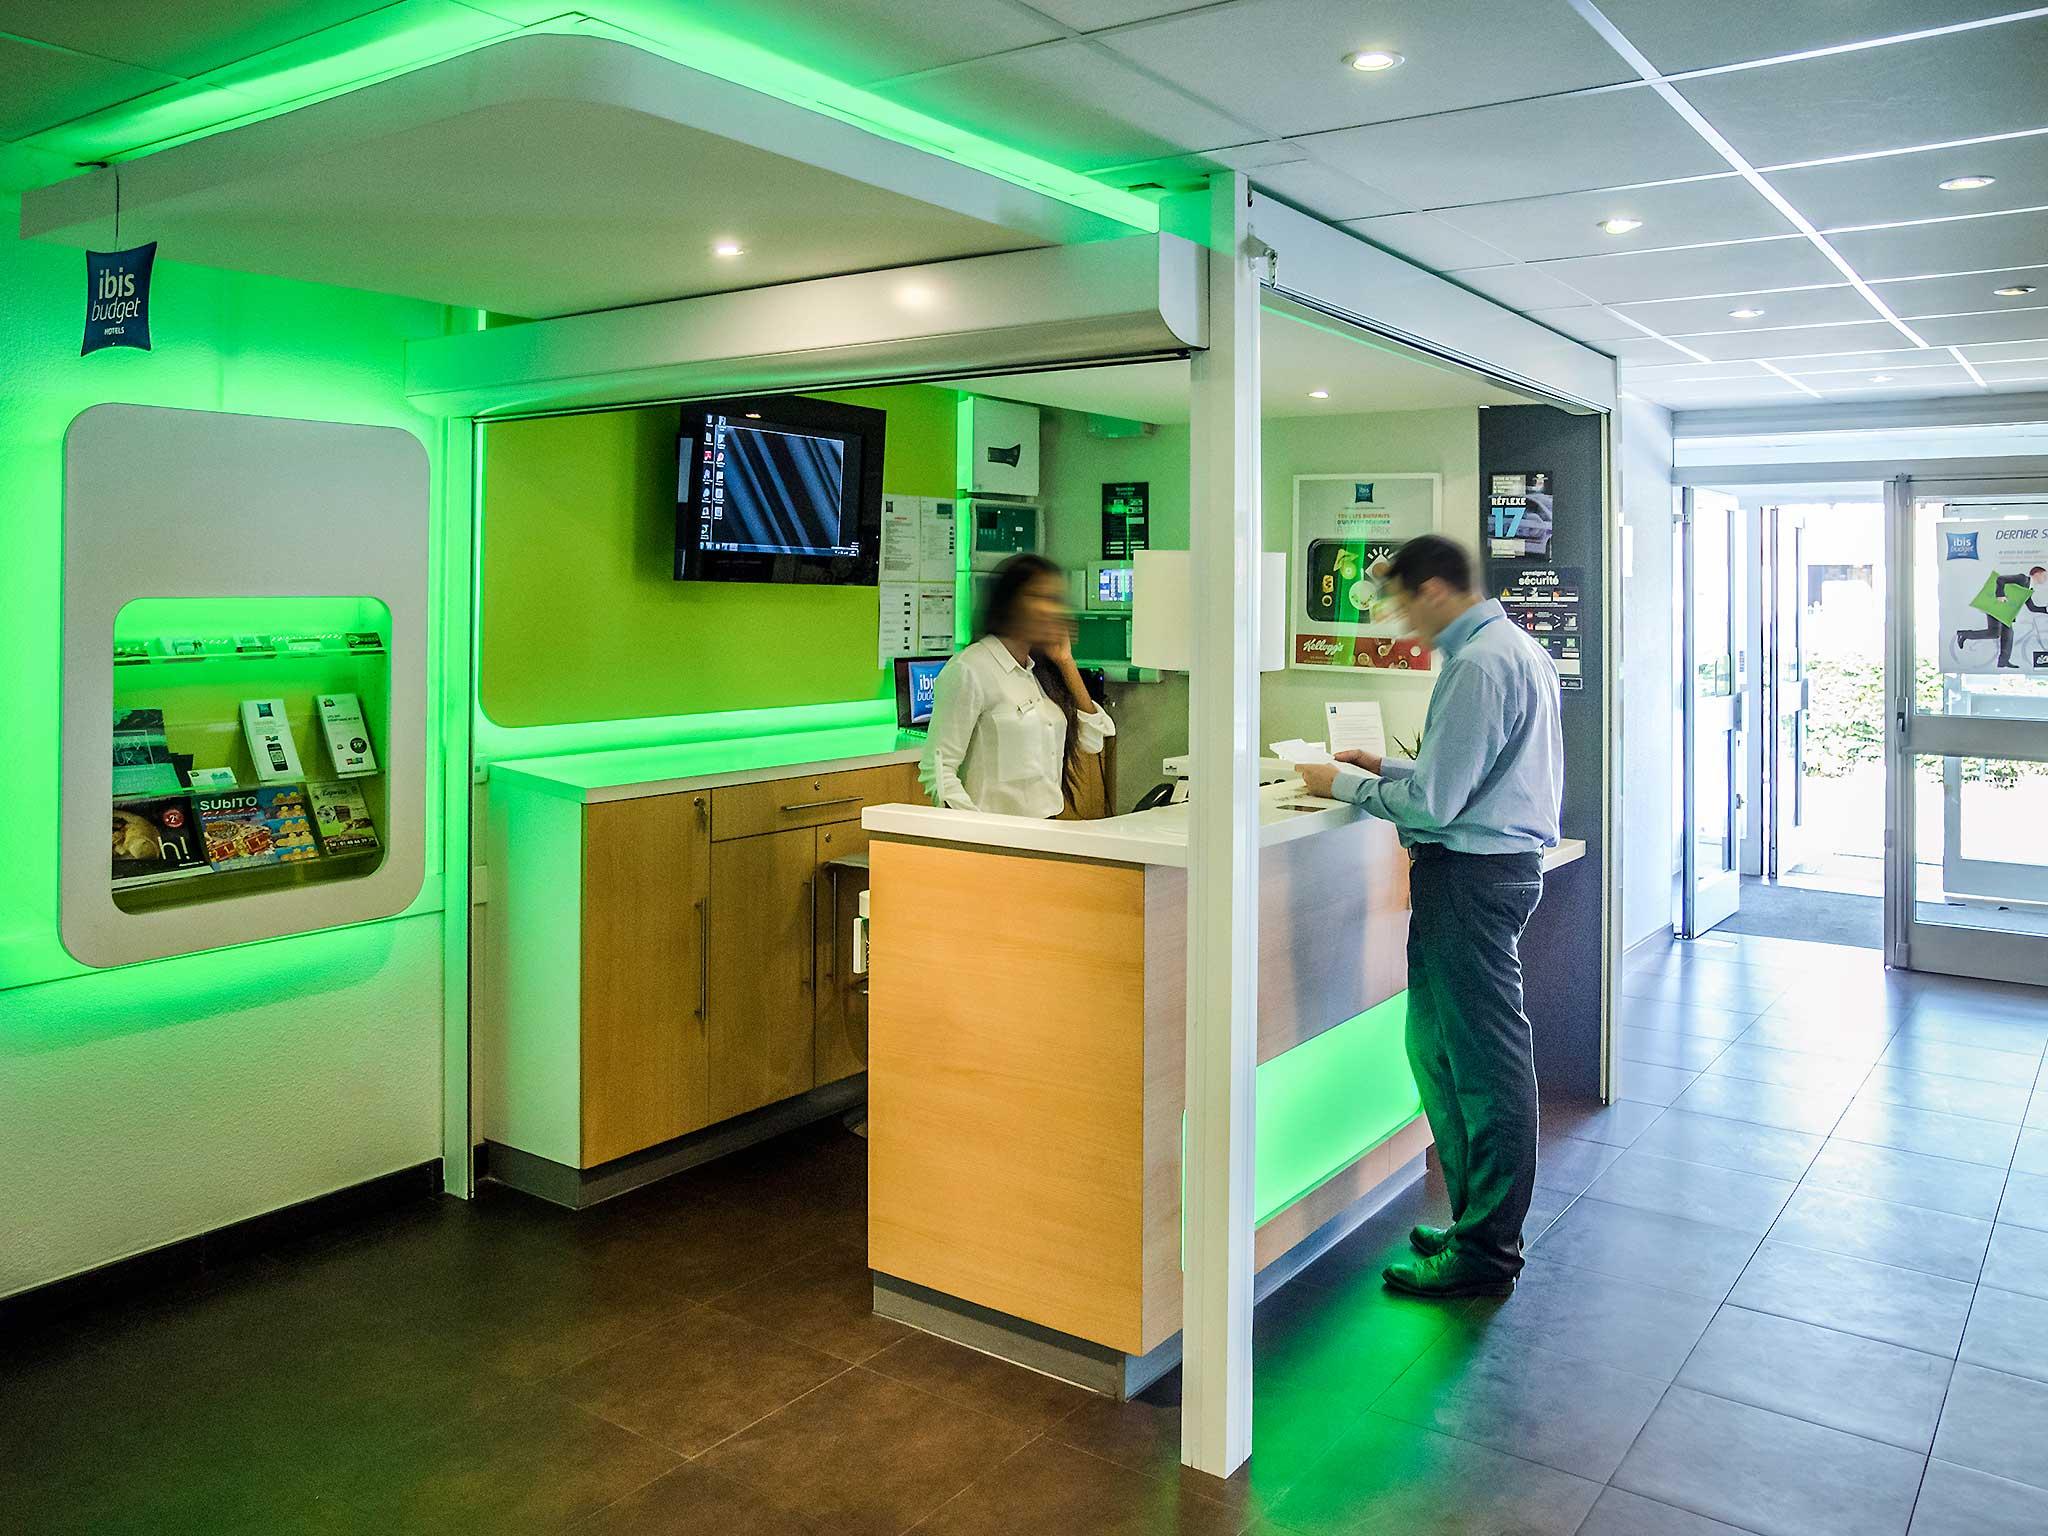 Hotel – ibis budget Aéroport Le Bourget Garonor